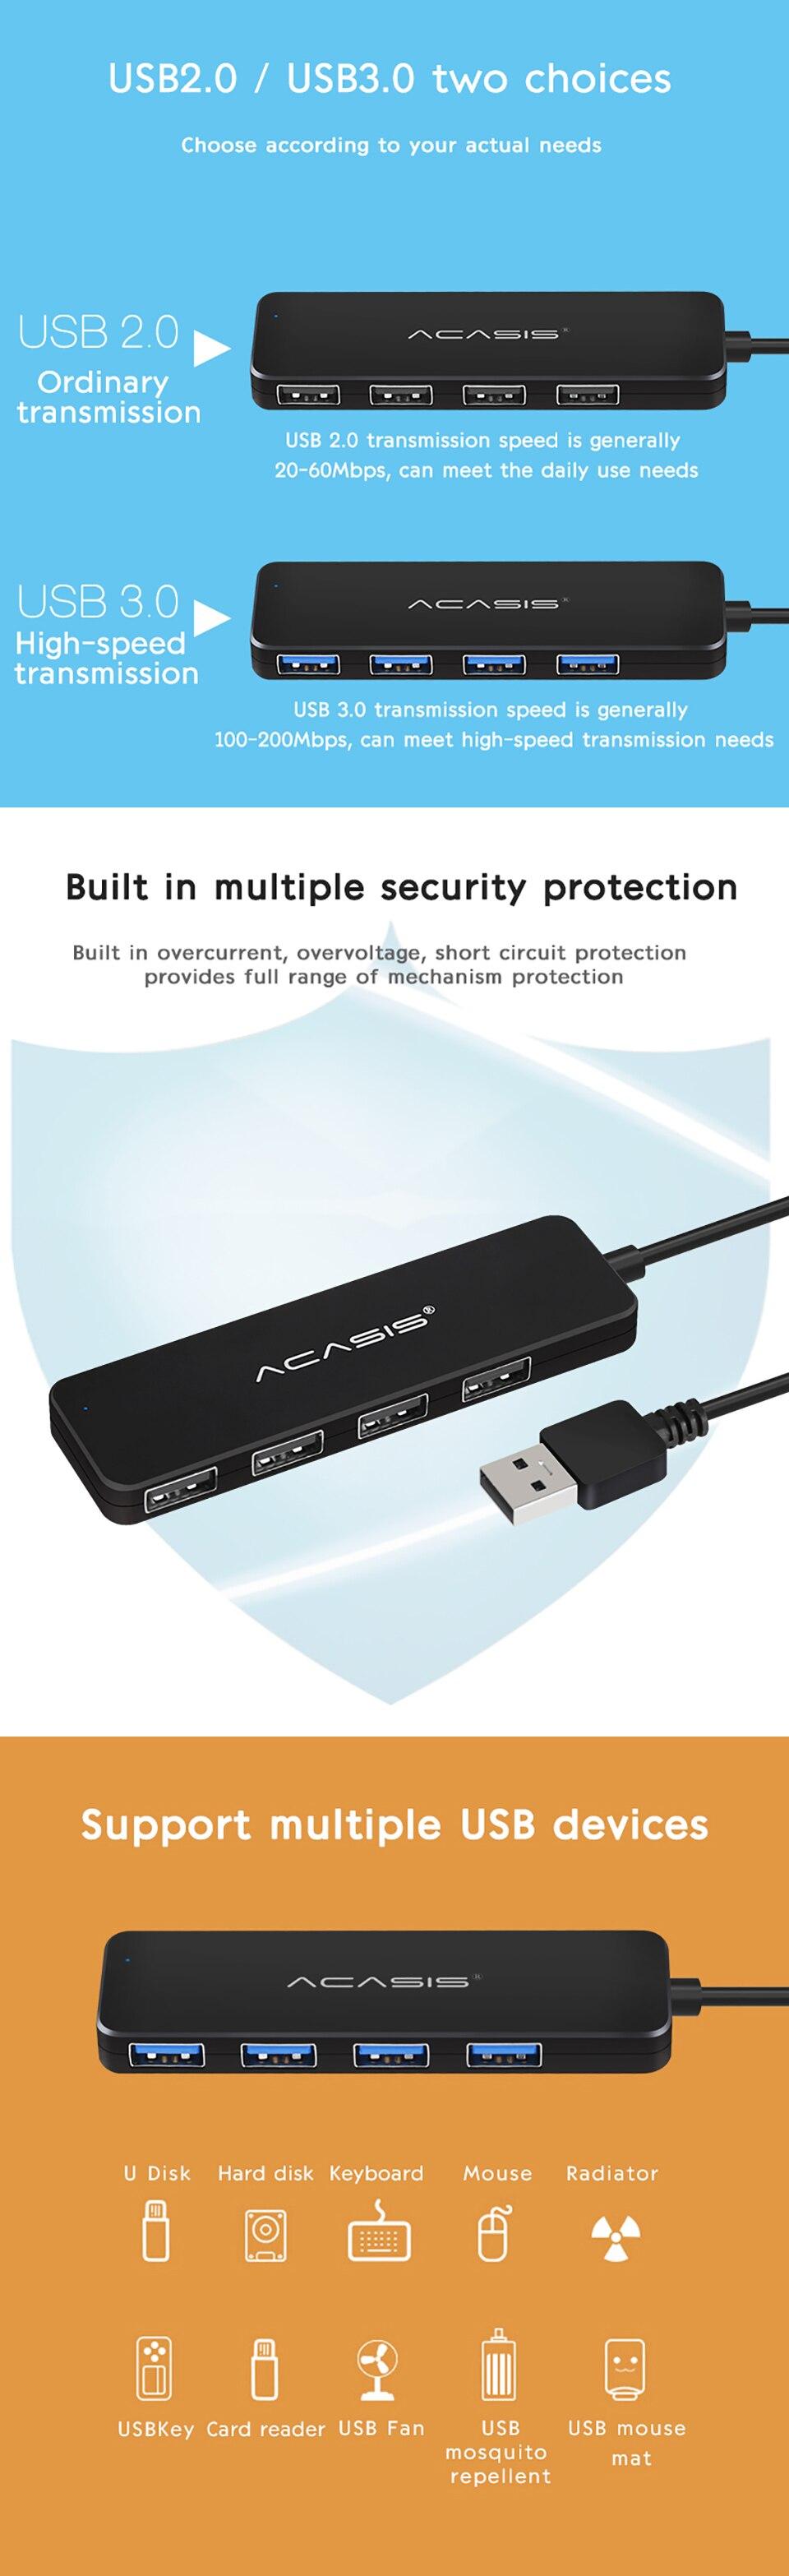 Acasis USB 3.0 Hub 4 Port External USB Splitter 2.0 with Micro Hub USB 3,0 Port Charging for iMac Accessories USB Extension#30